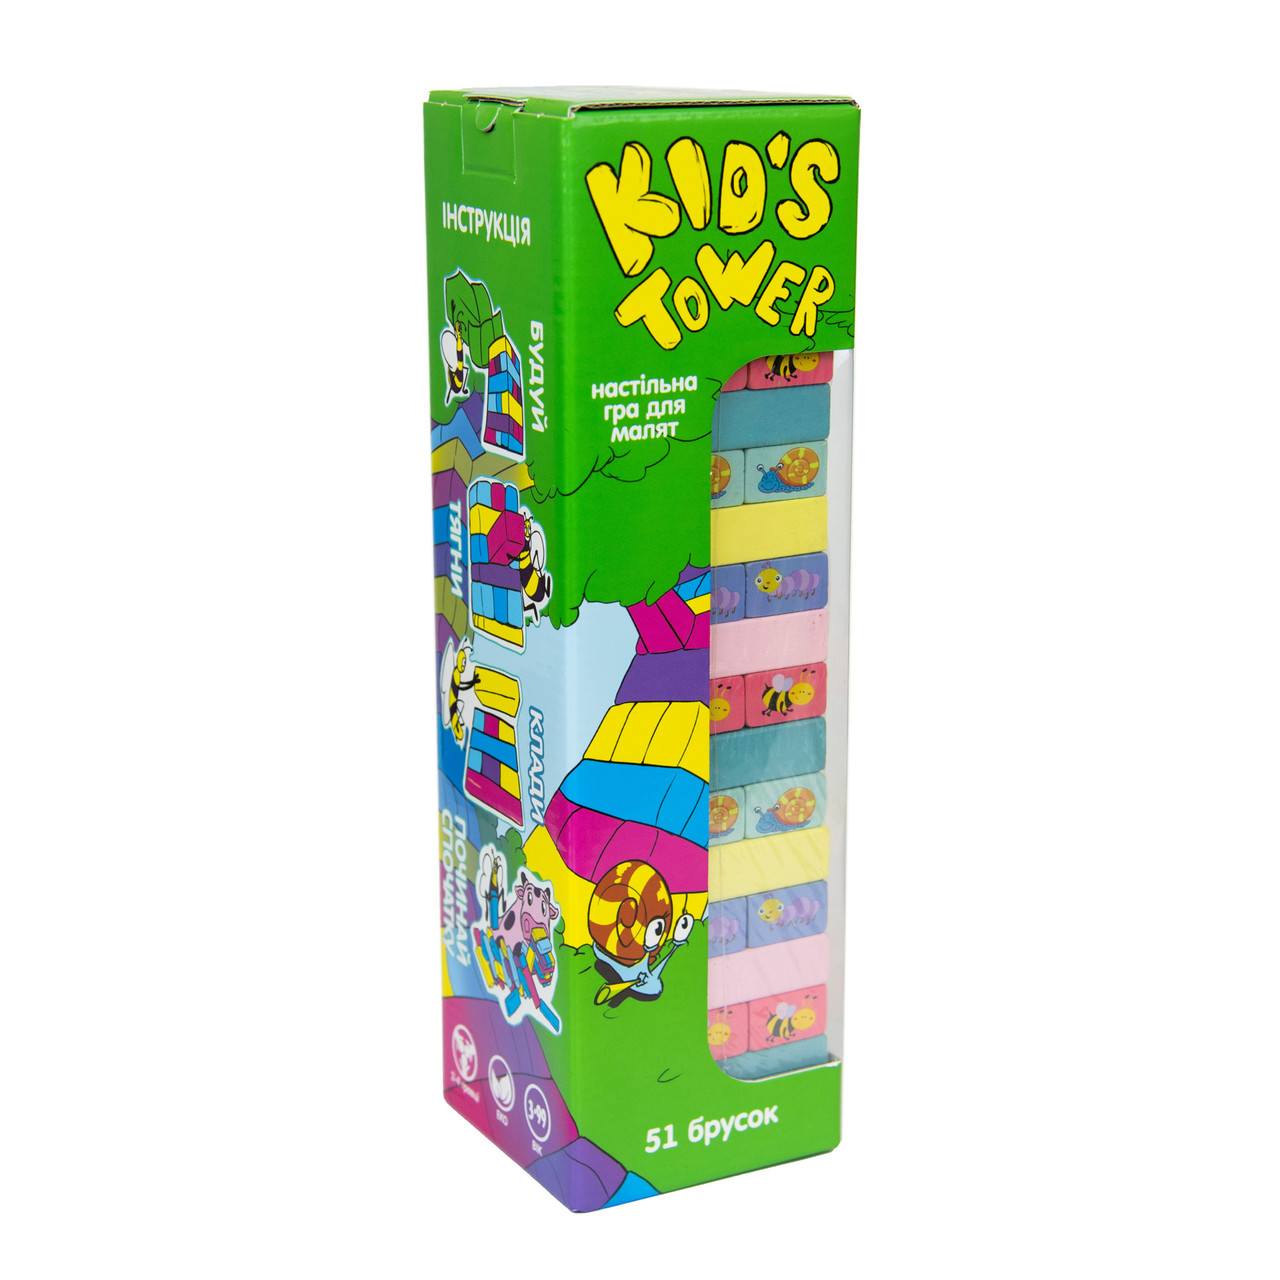 Kid's Tower настільна гра джанга бруска 54